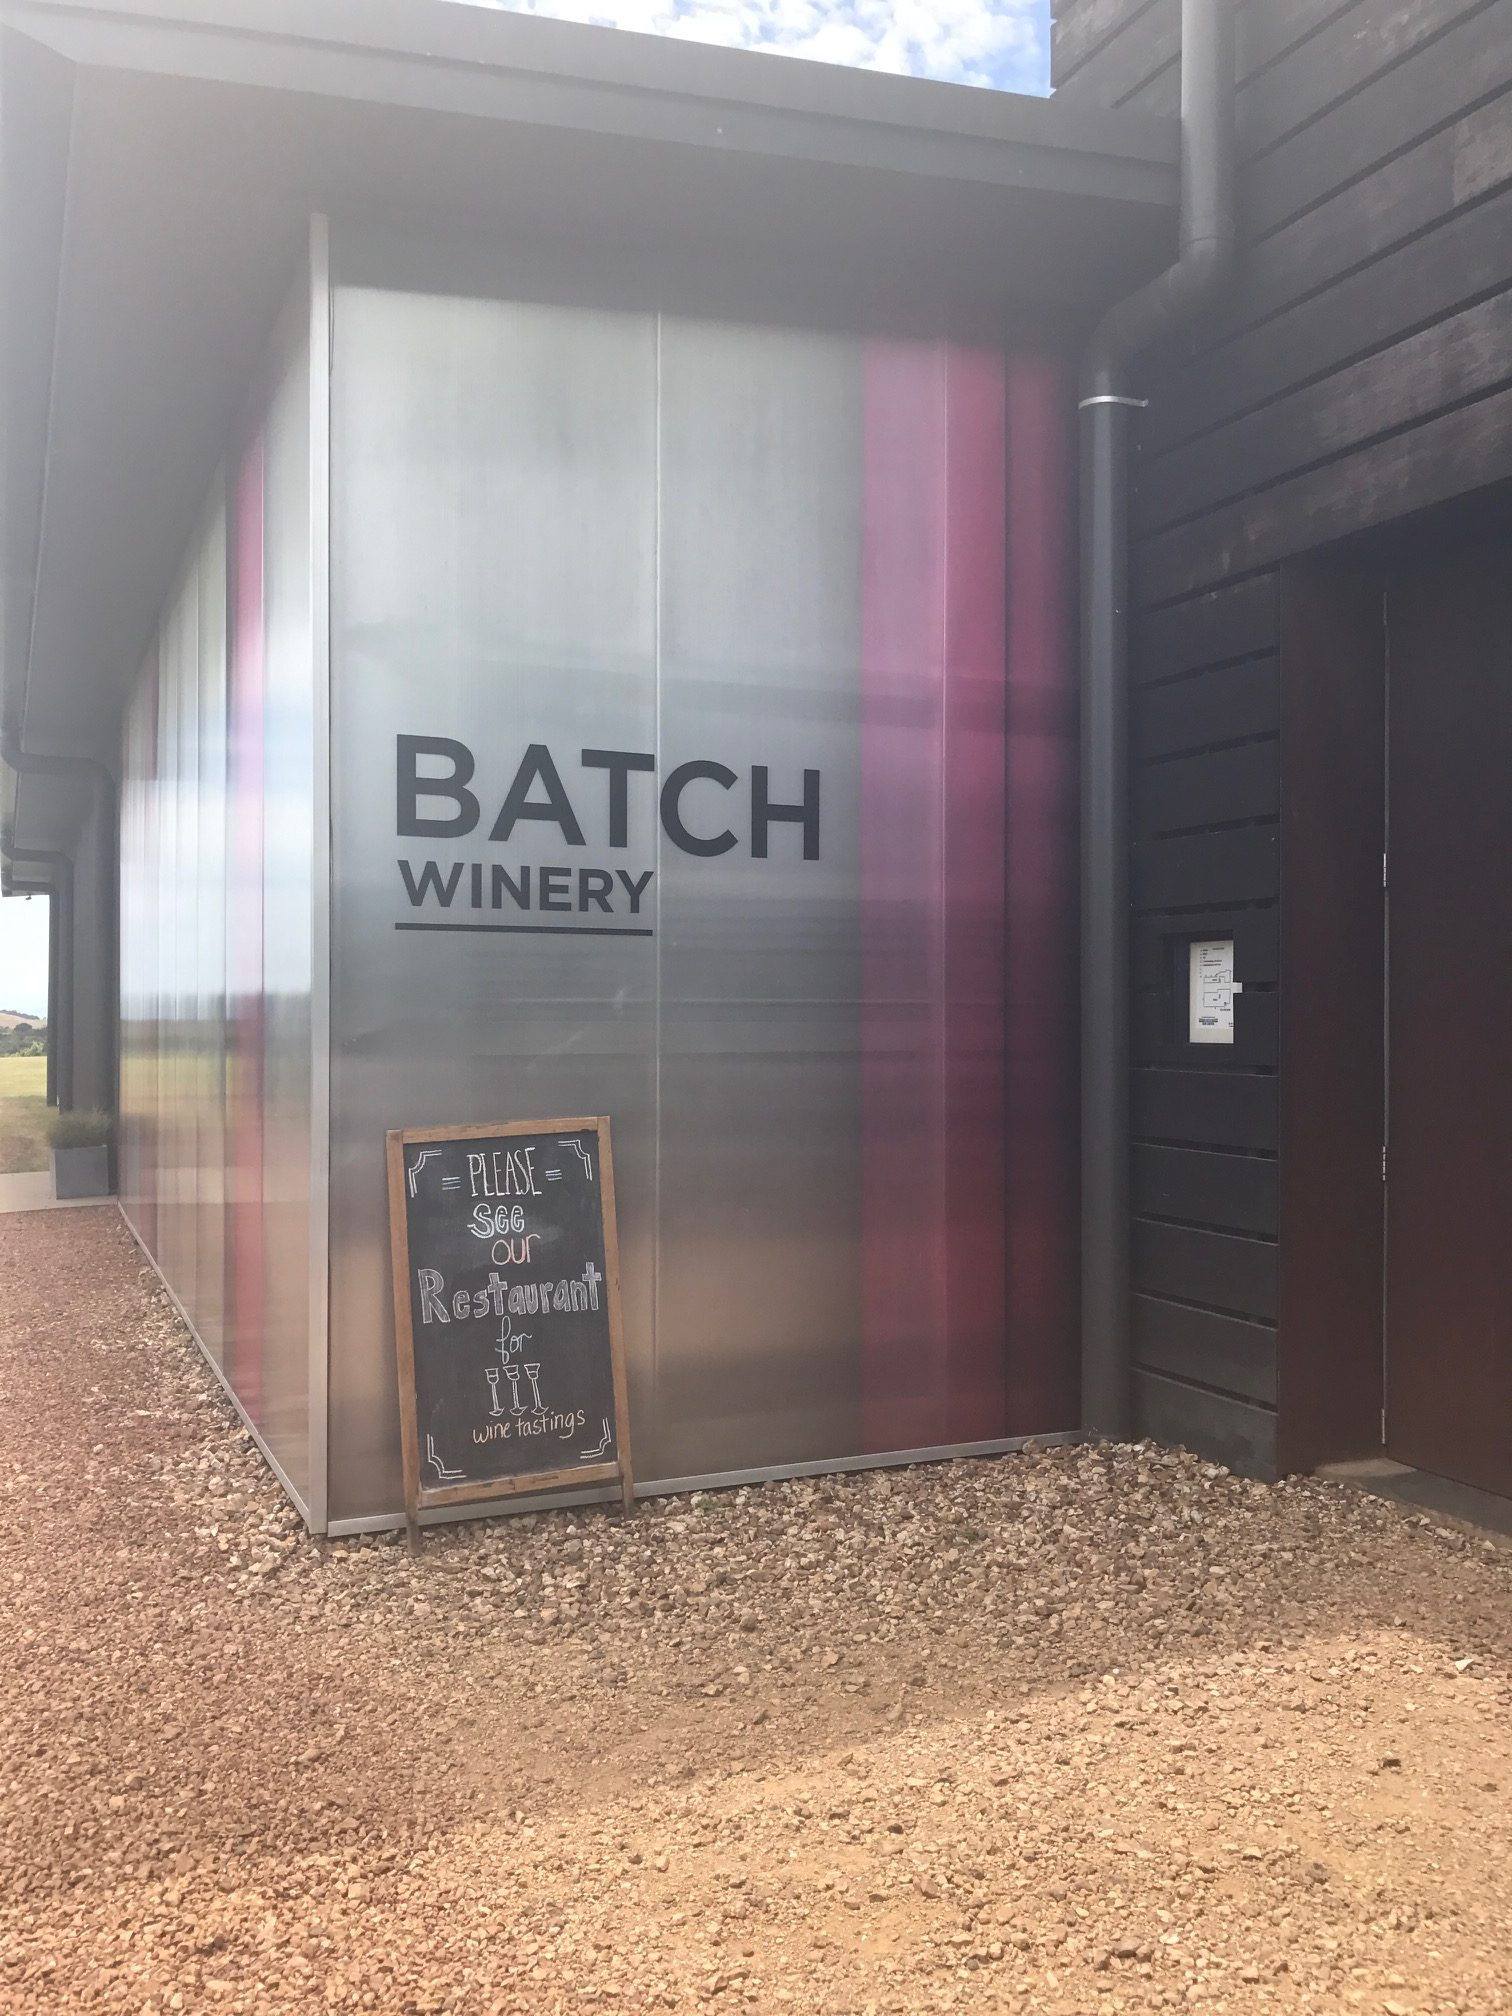 Batch Winery Waiheke Island